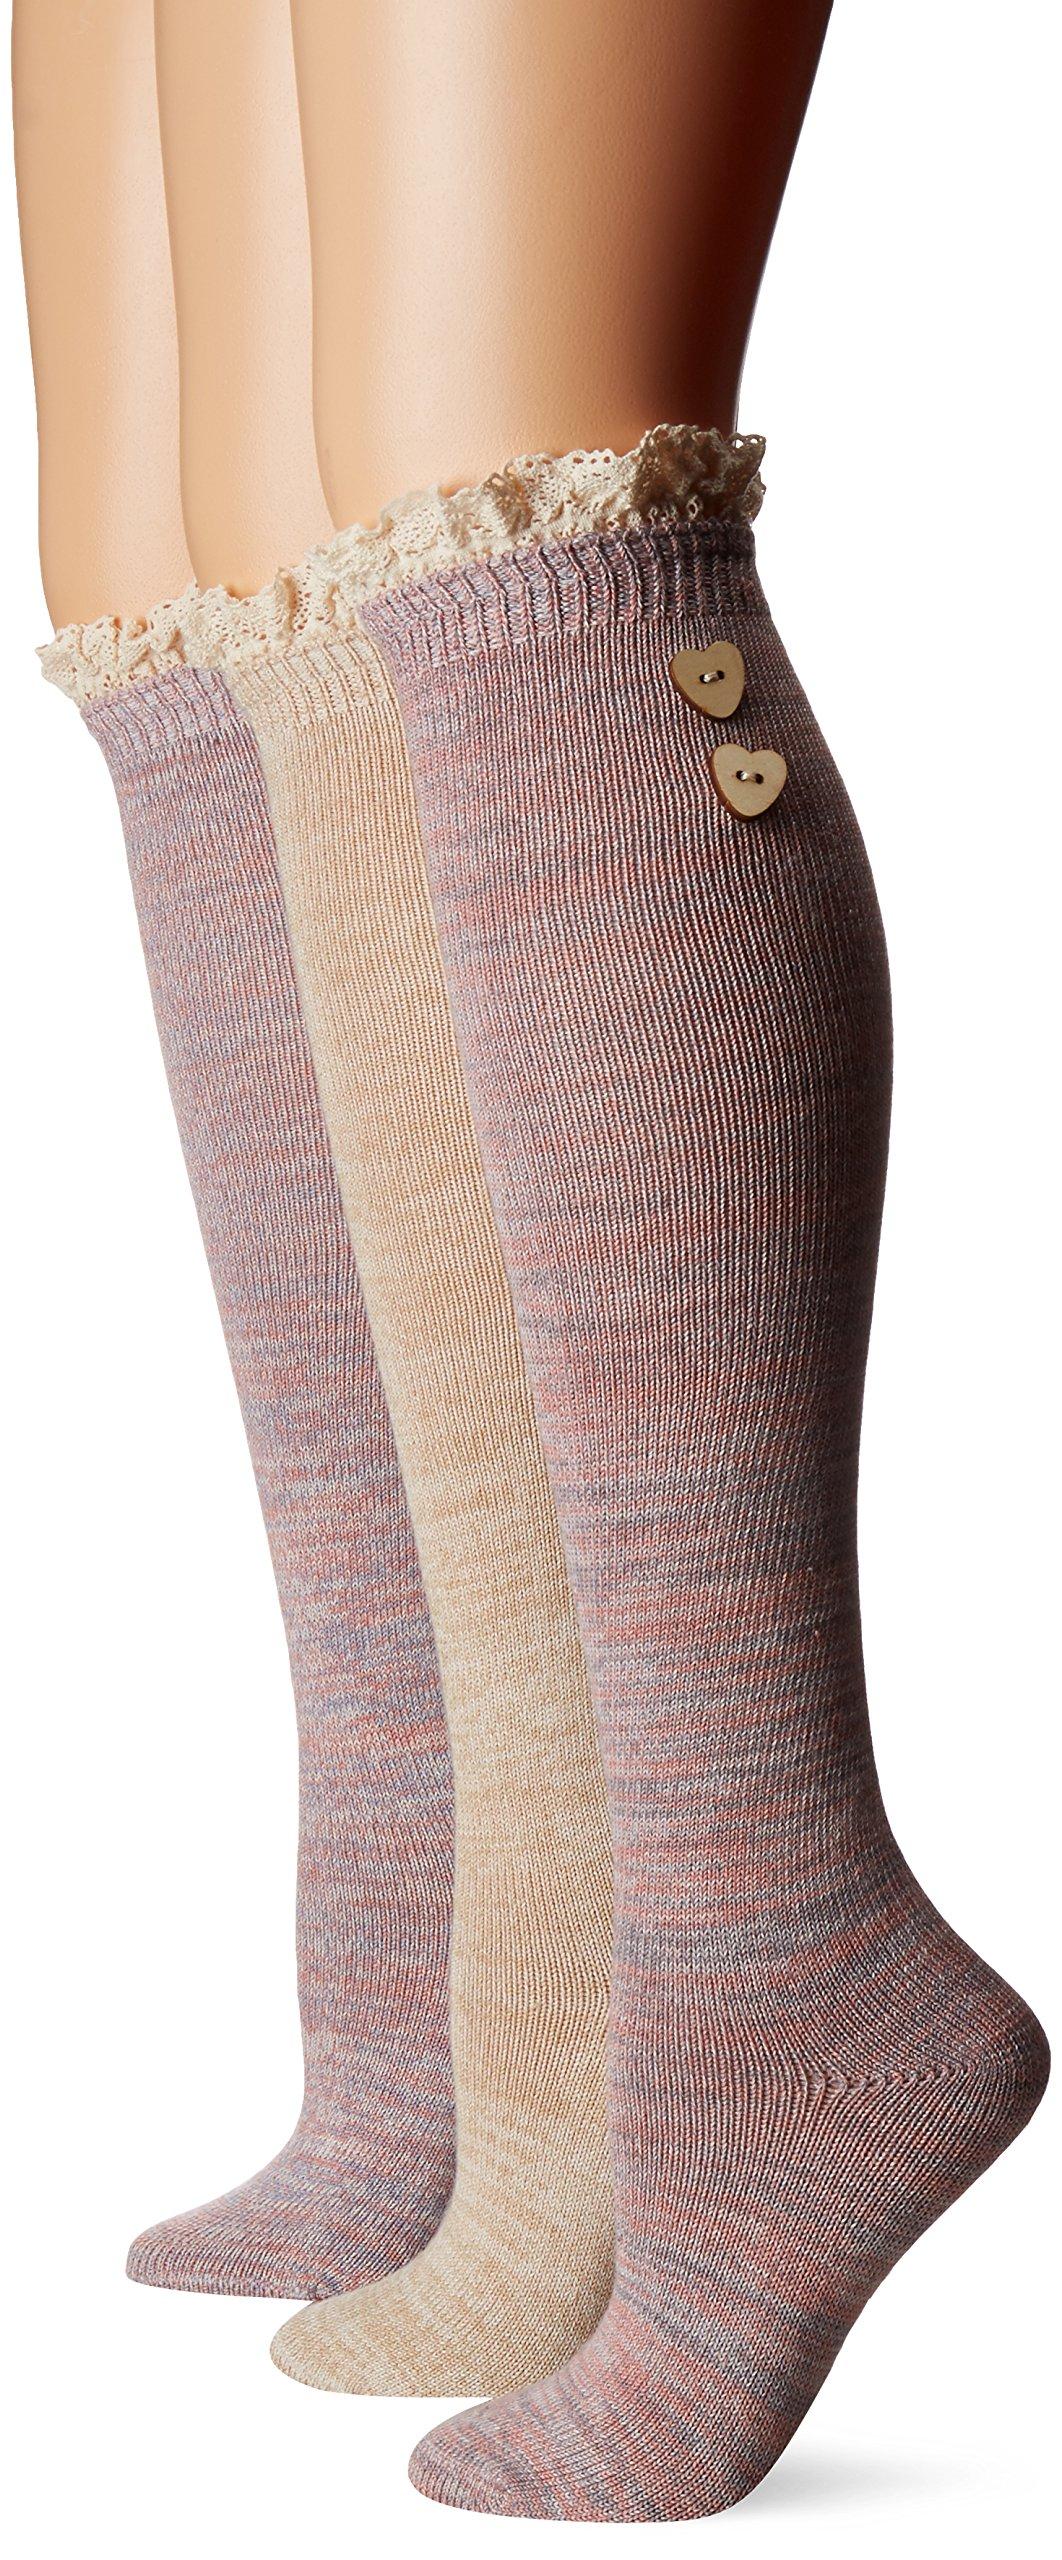 Muk Luks Women's 3 Pair Pack Lace Top Knee High Socks, Multi, OSFM